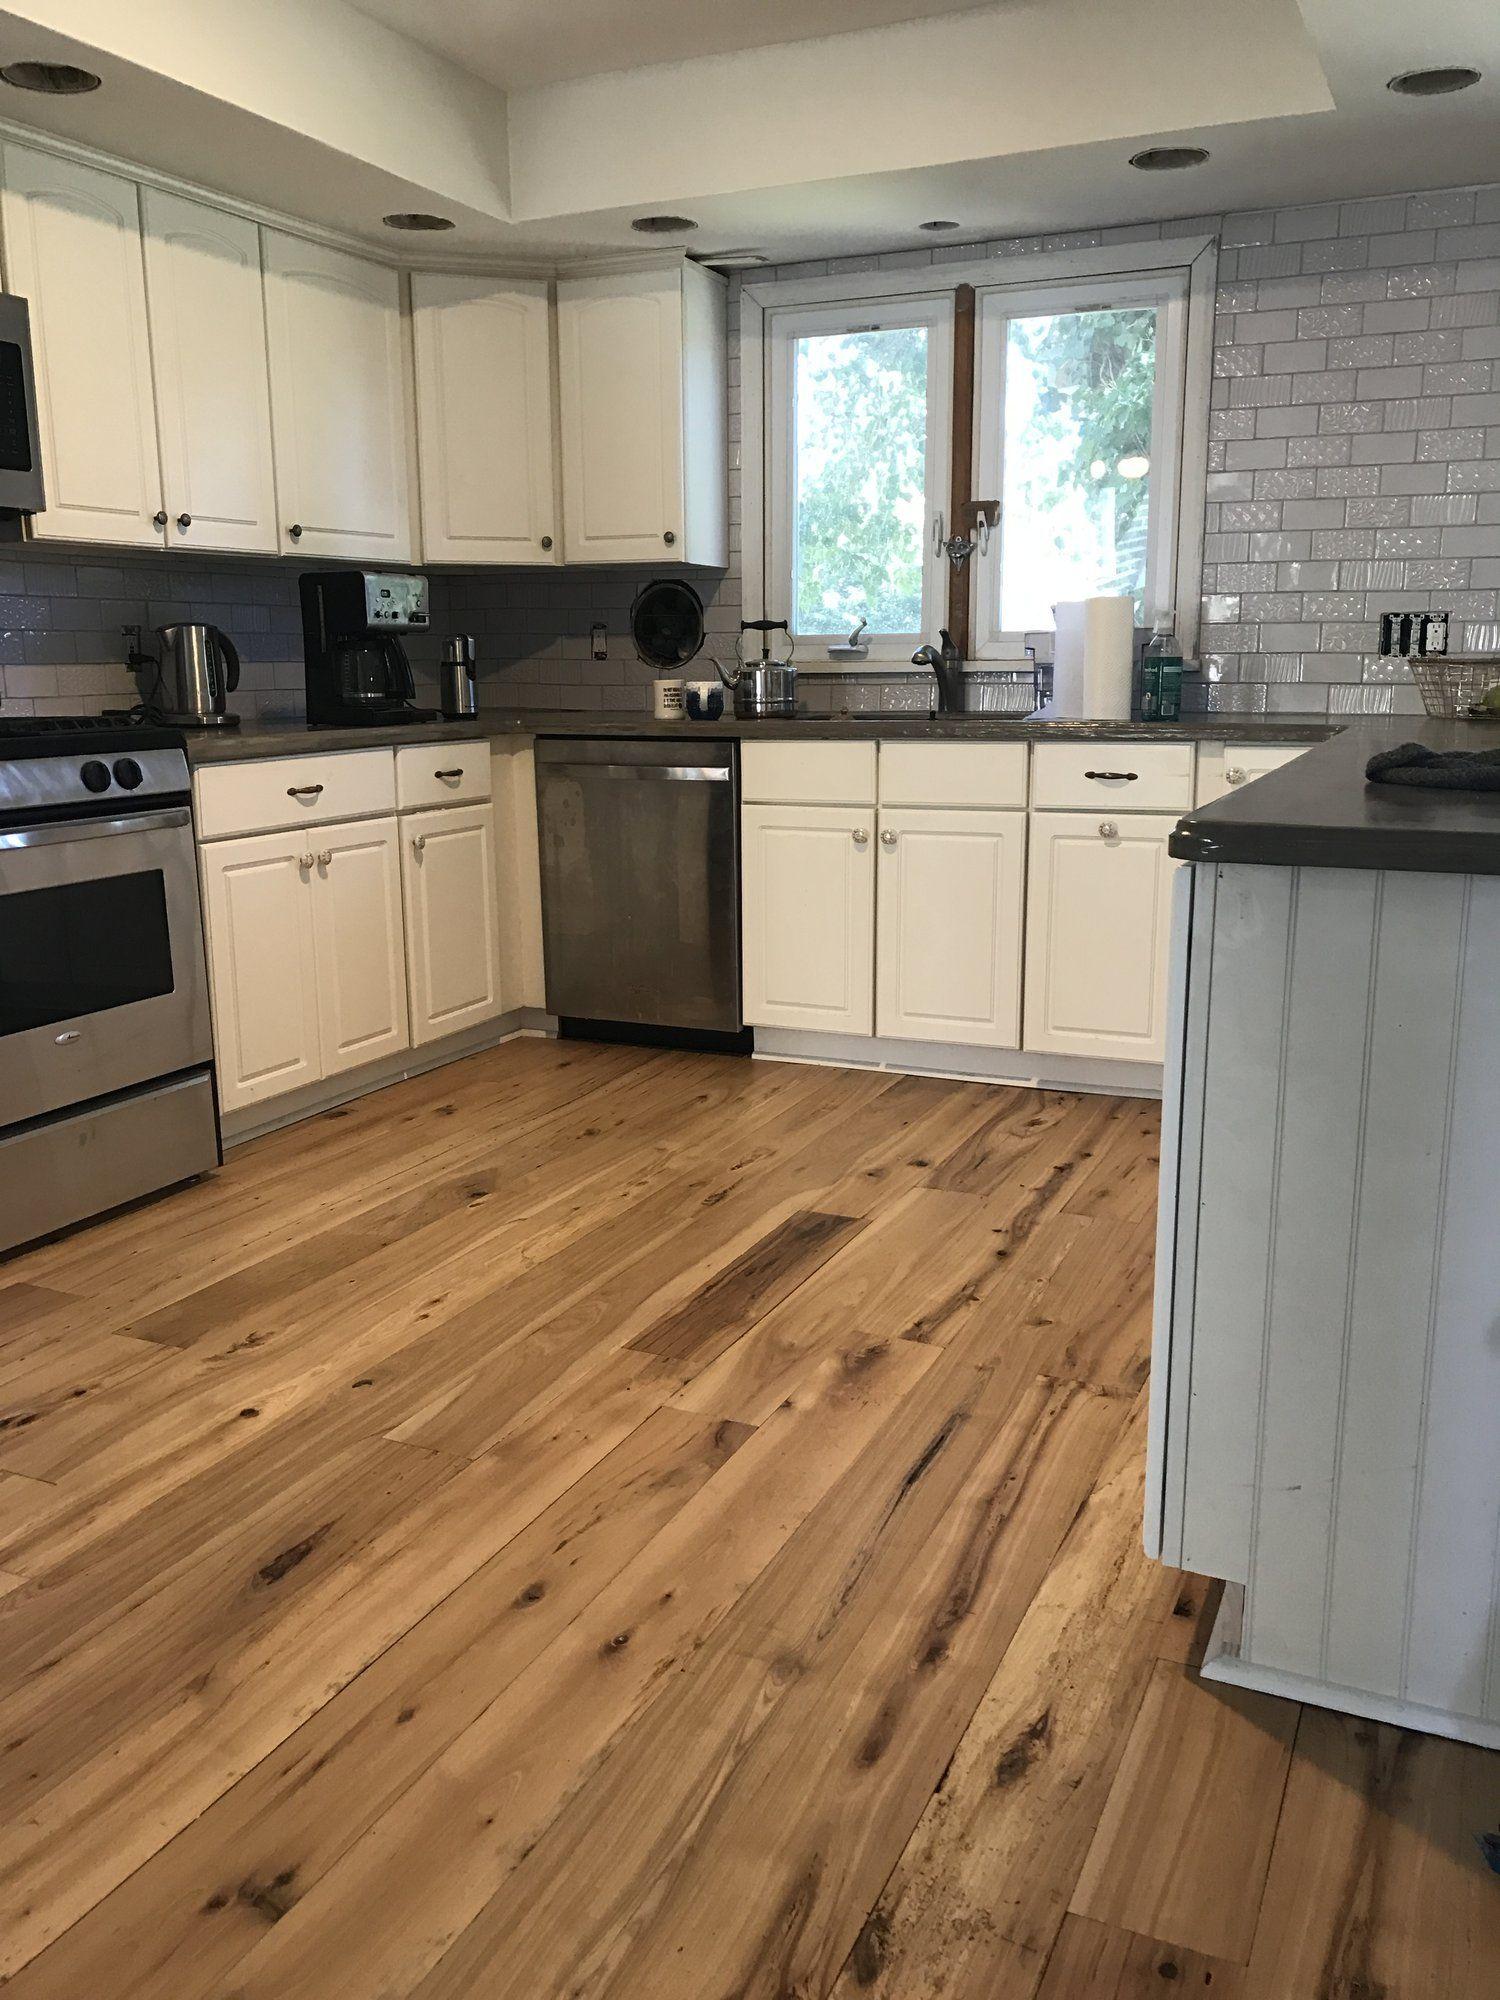 Reclaimed Wood Flooring How to antique wood, Flooring